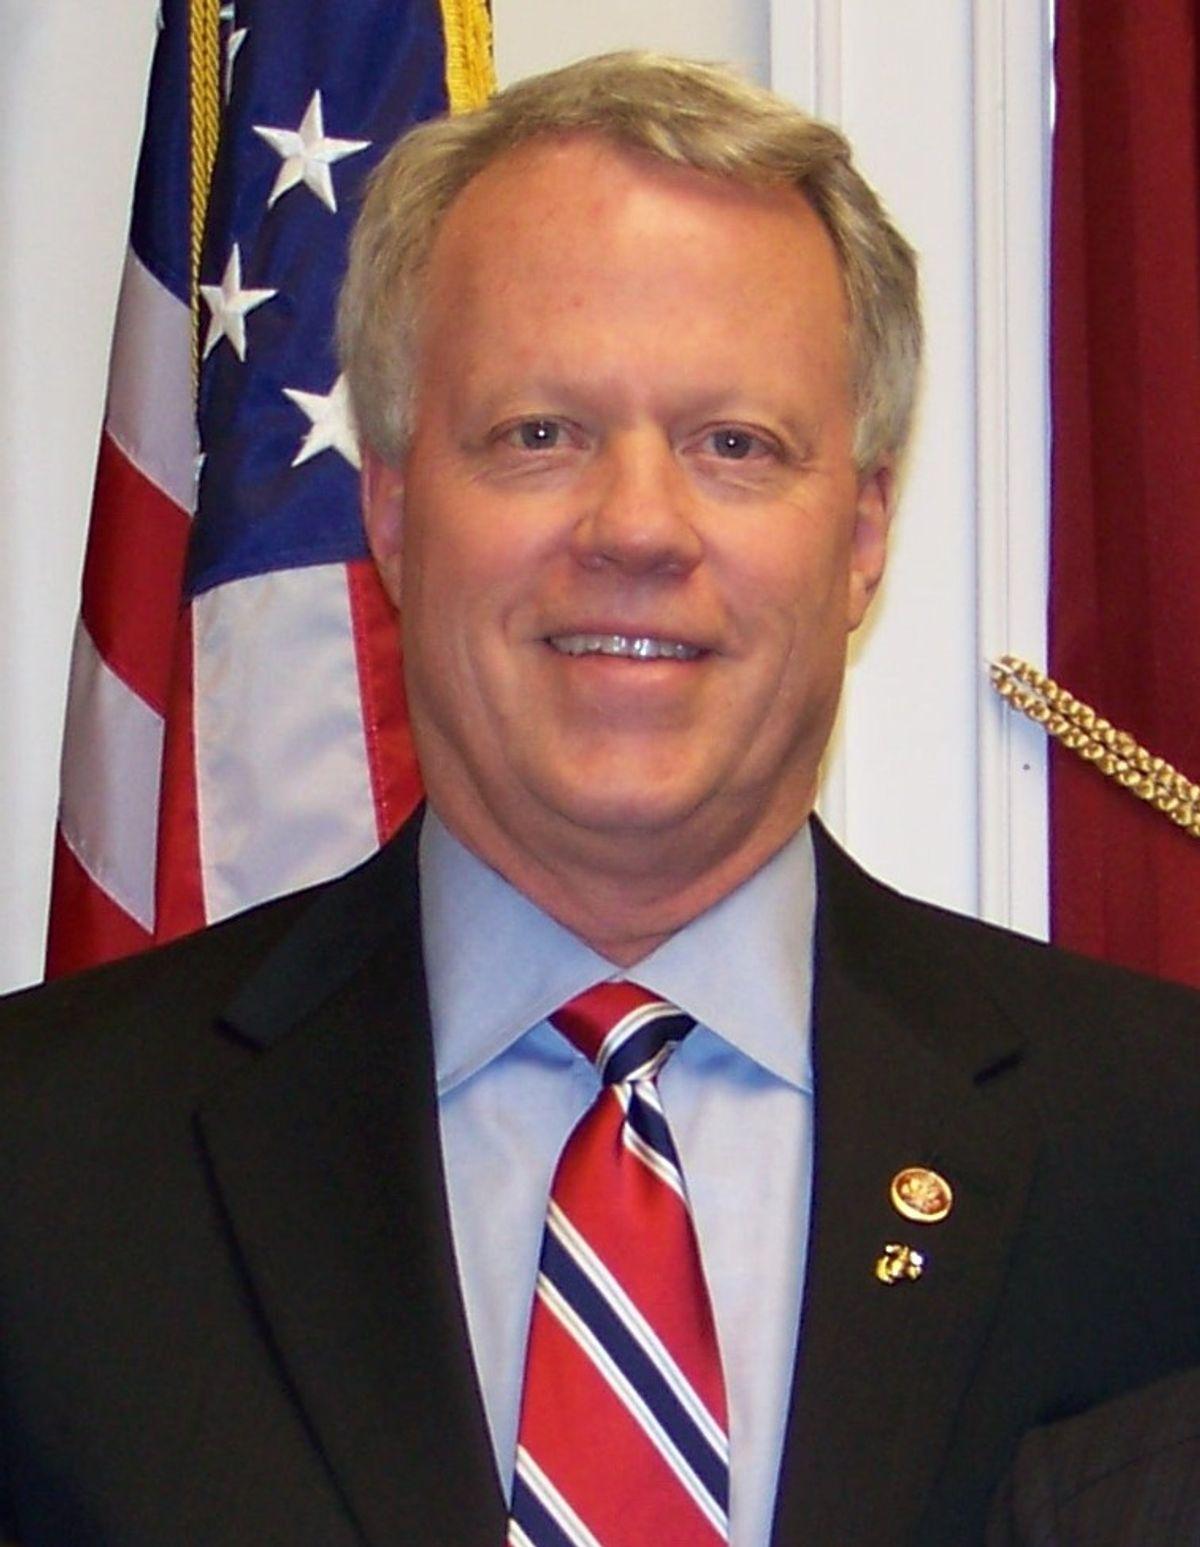 Rep. Paul Broun (R-GA)